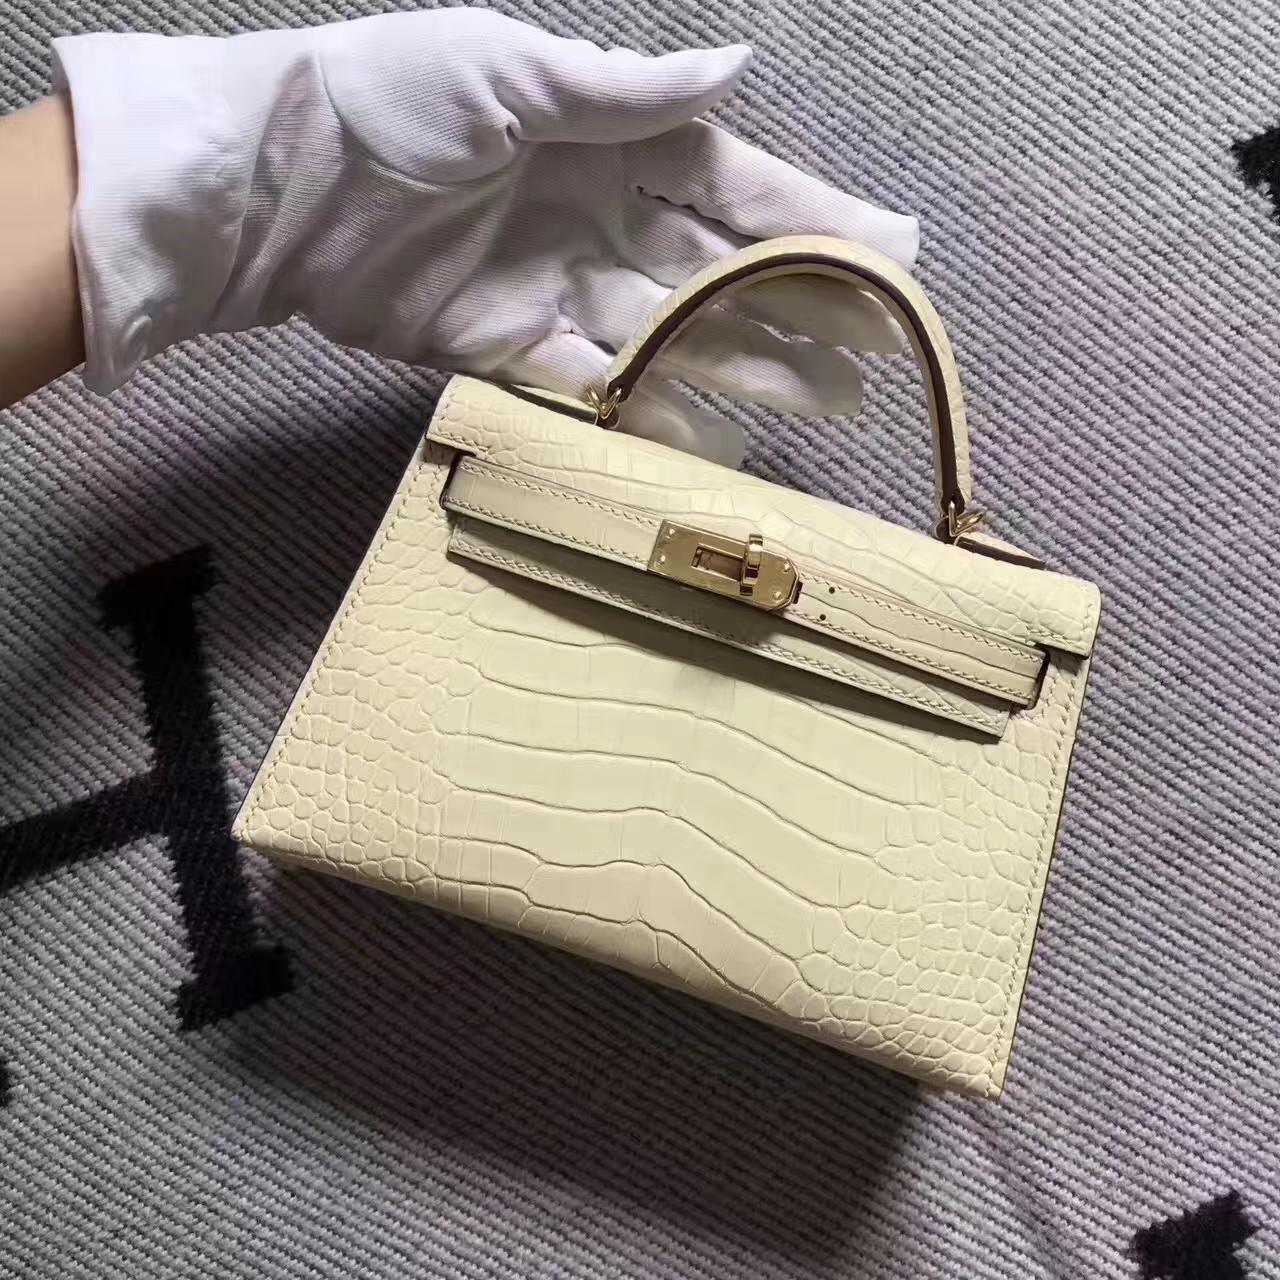 Noble Hermes Crocodile Matt Leather Minikelly-2 in Milk Tea Color Gold Hardware